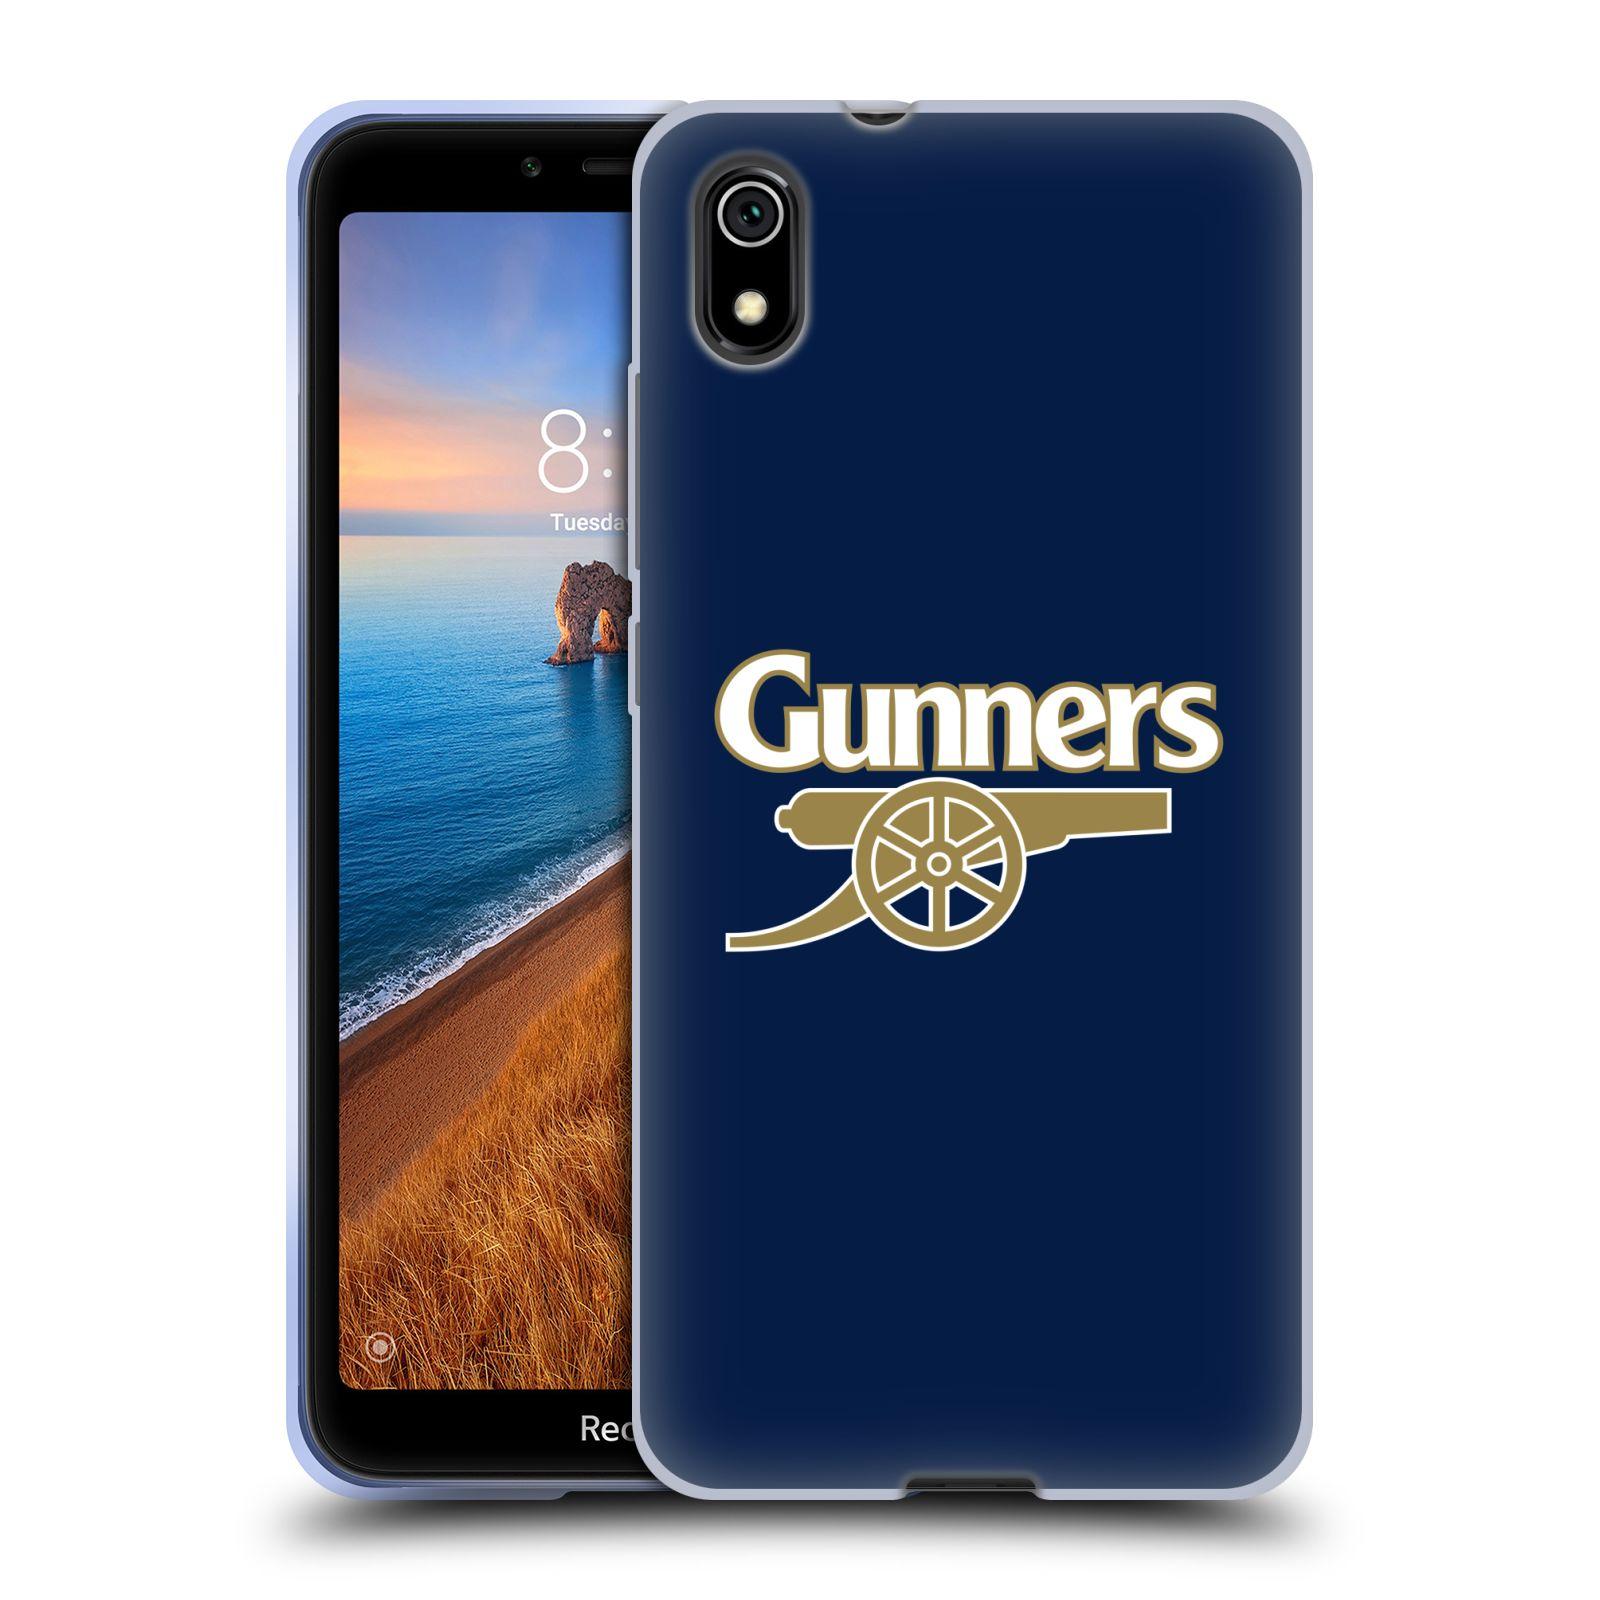 Silikonové pouzdro na mobil Redmi 7A - Head Case - Arsenal FC - Gunners